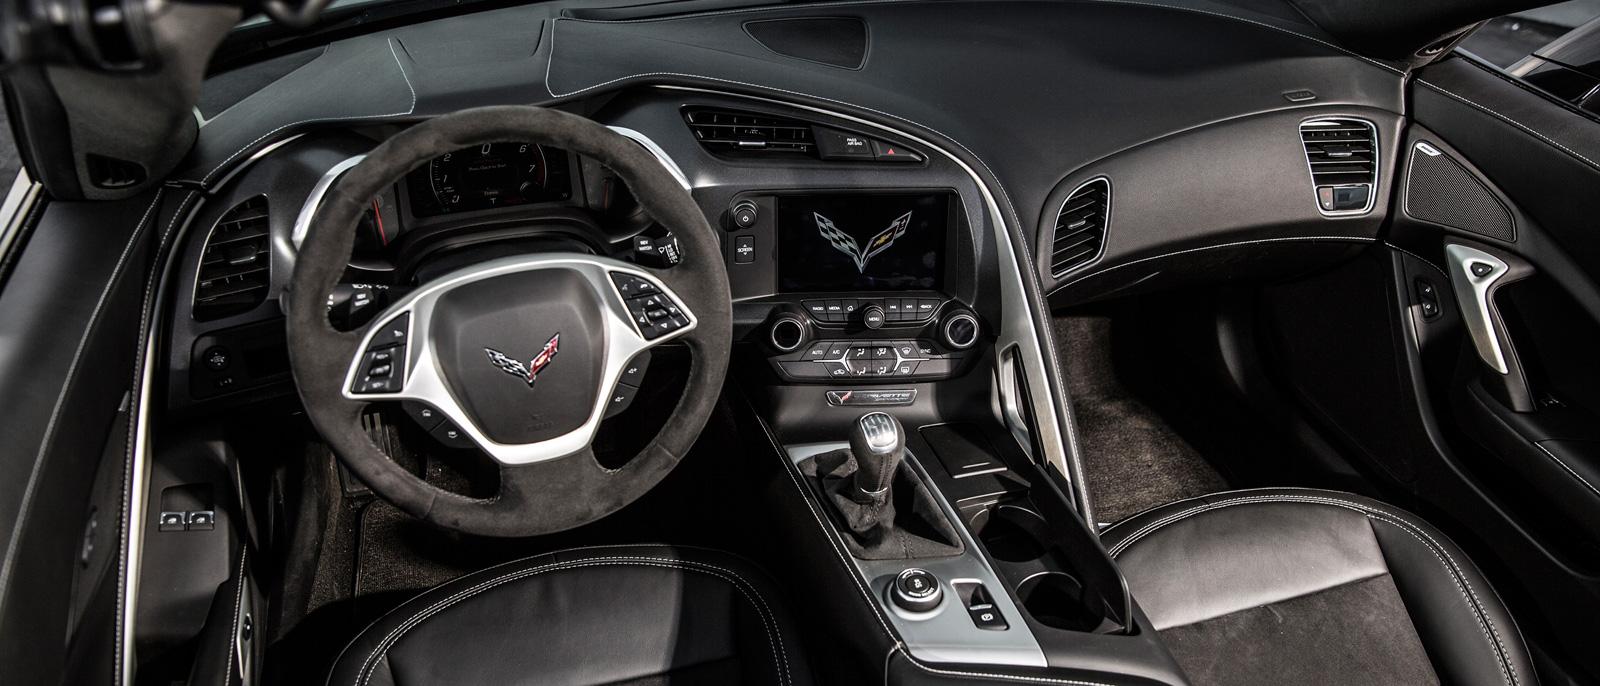 2016 Chevrolet Corvette interior